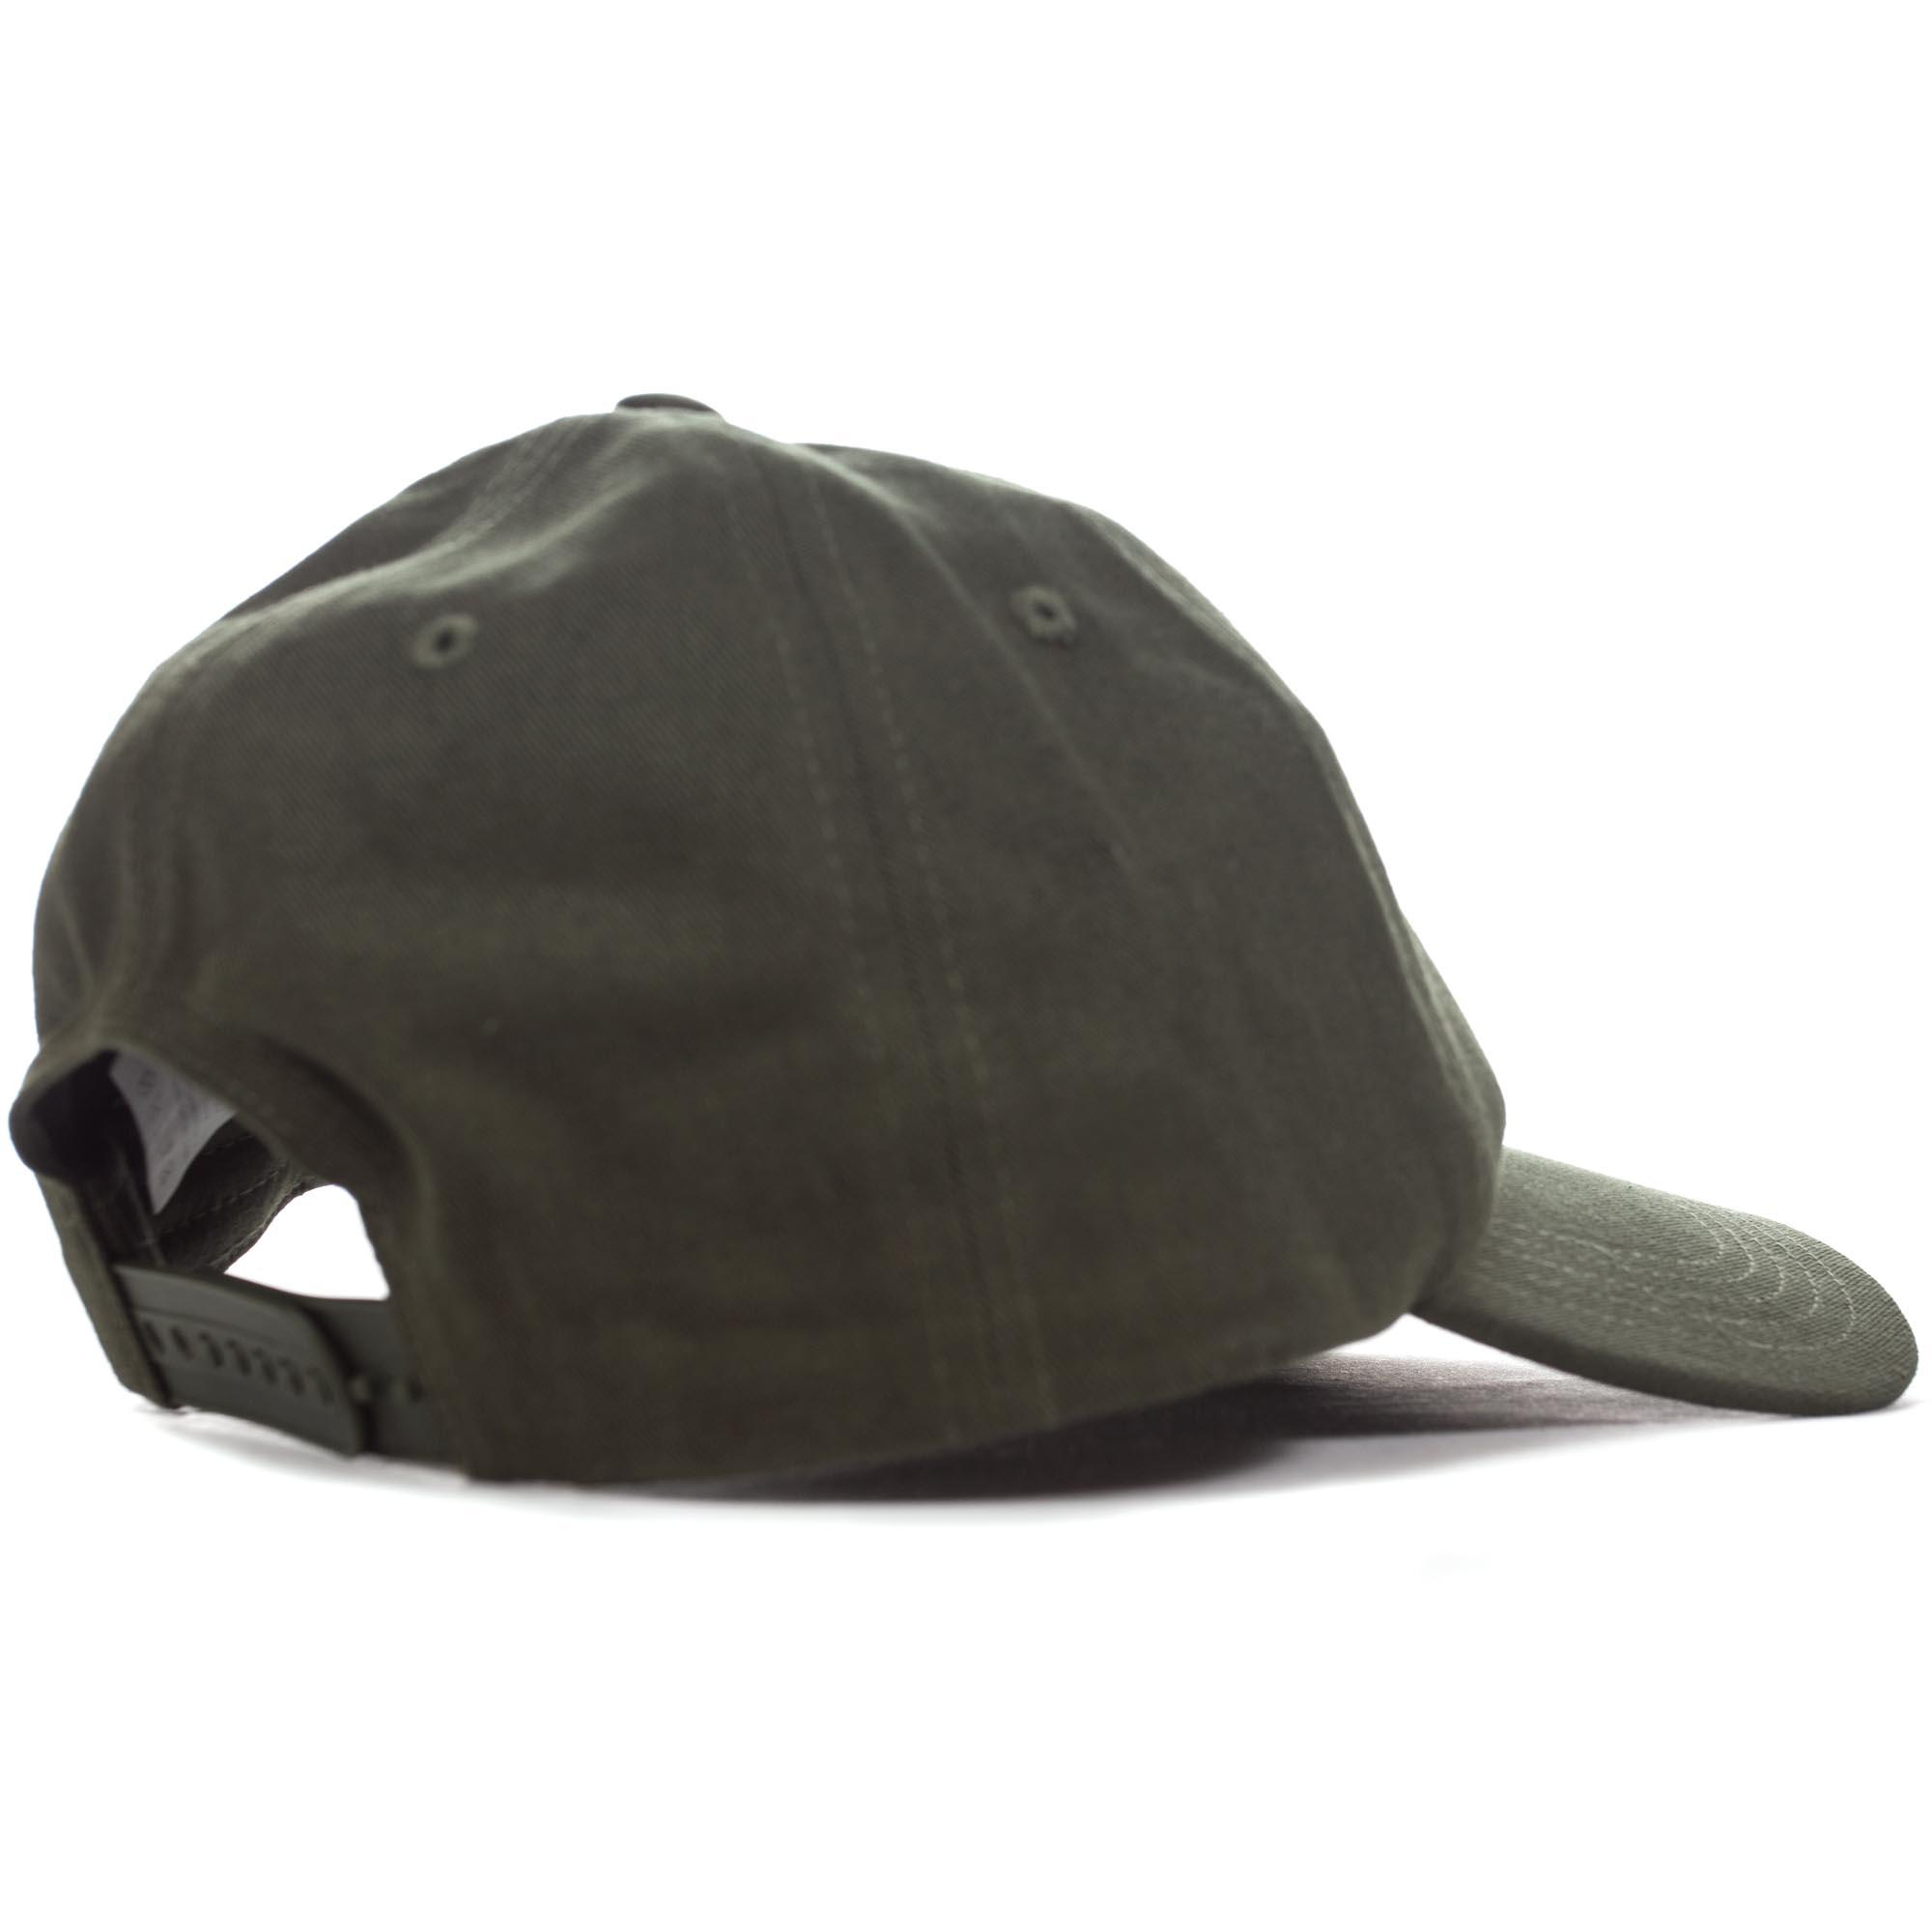 ccb2de22fdeb86 New Balance Mens 6-Panel Curved Brim Snapback Baseball Cap Hat | eBay